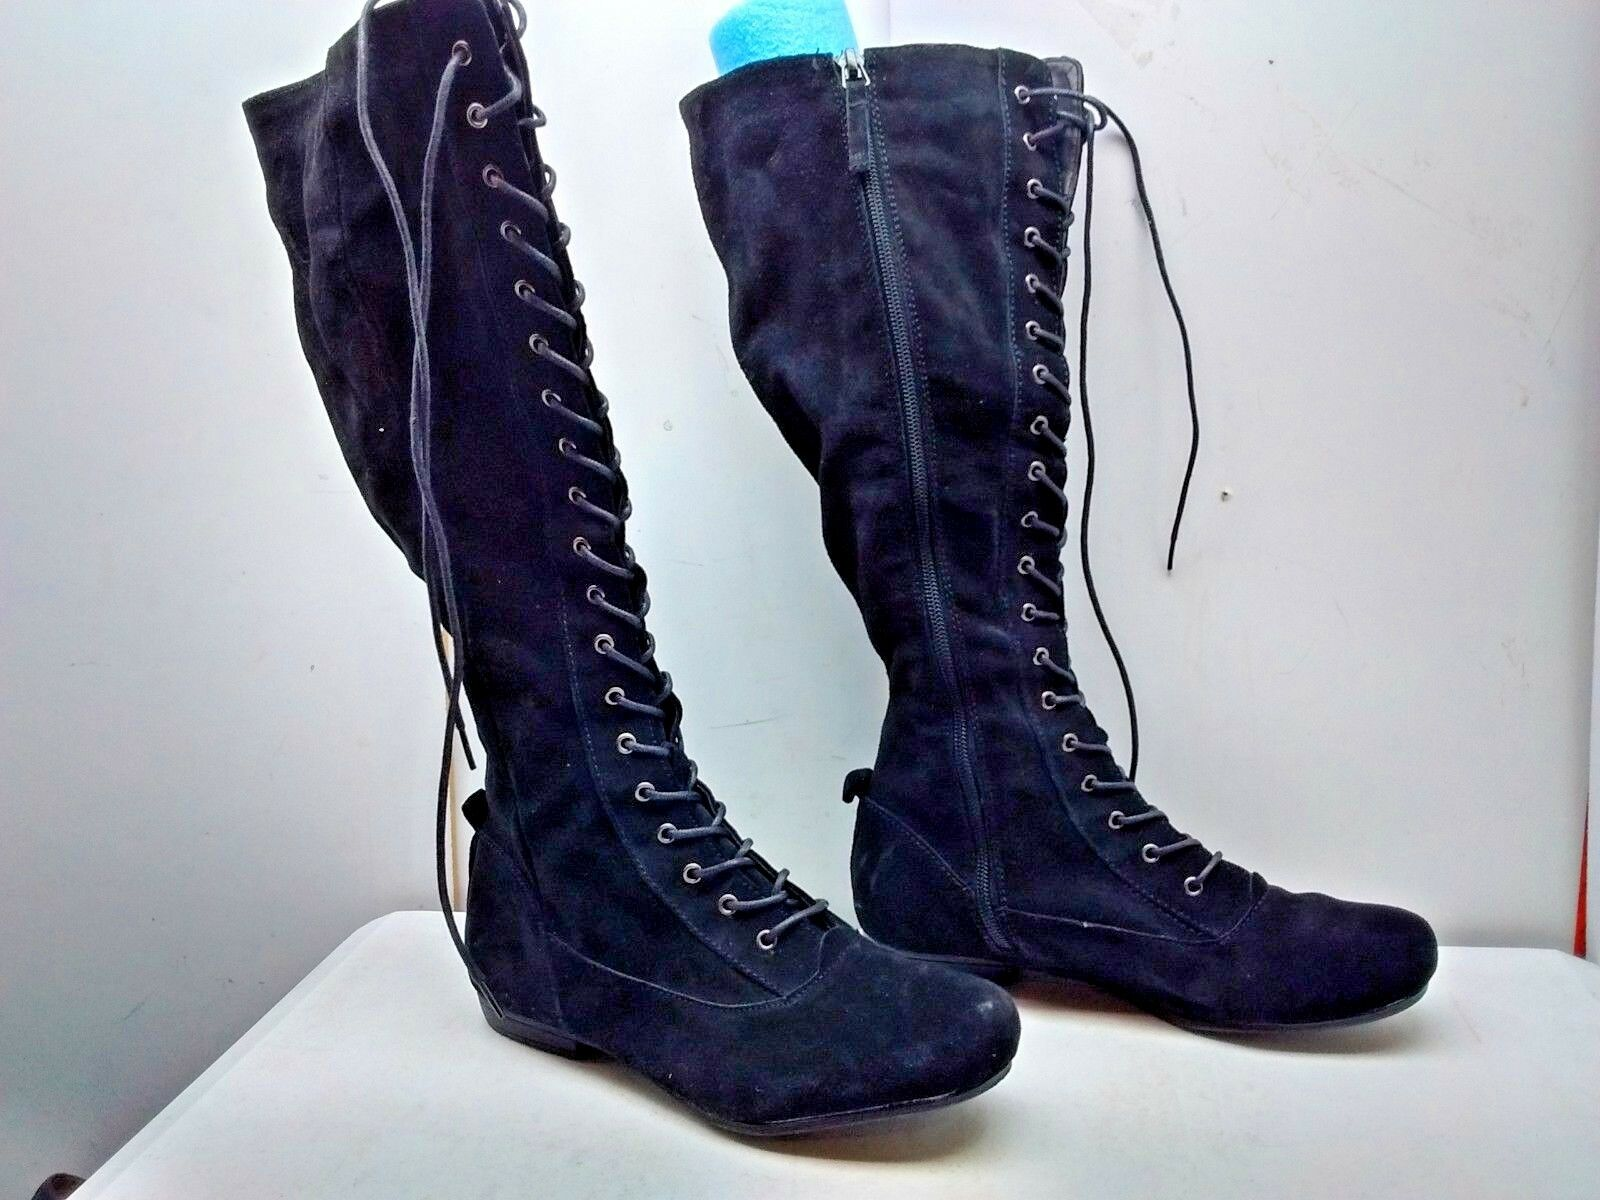 Nine West Casilda  nero Leather Knee High Tall Lace Zip avvio scarpe donna 7M